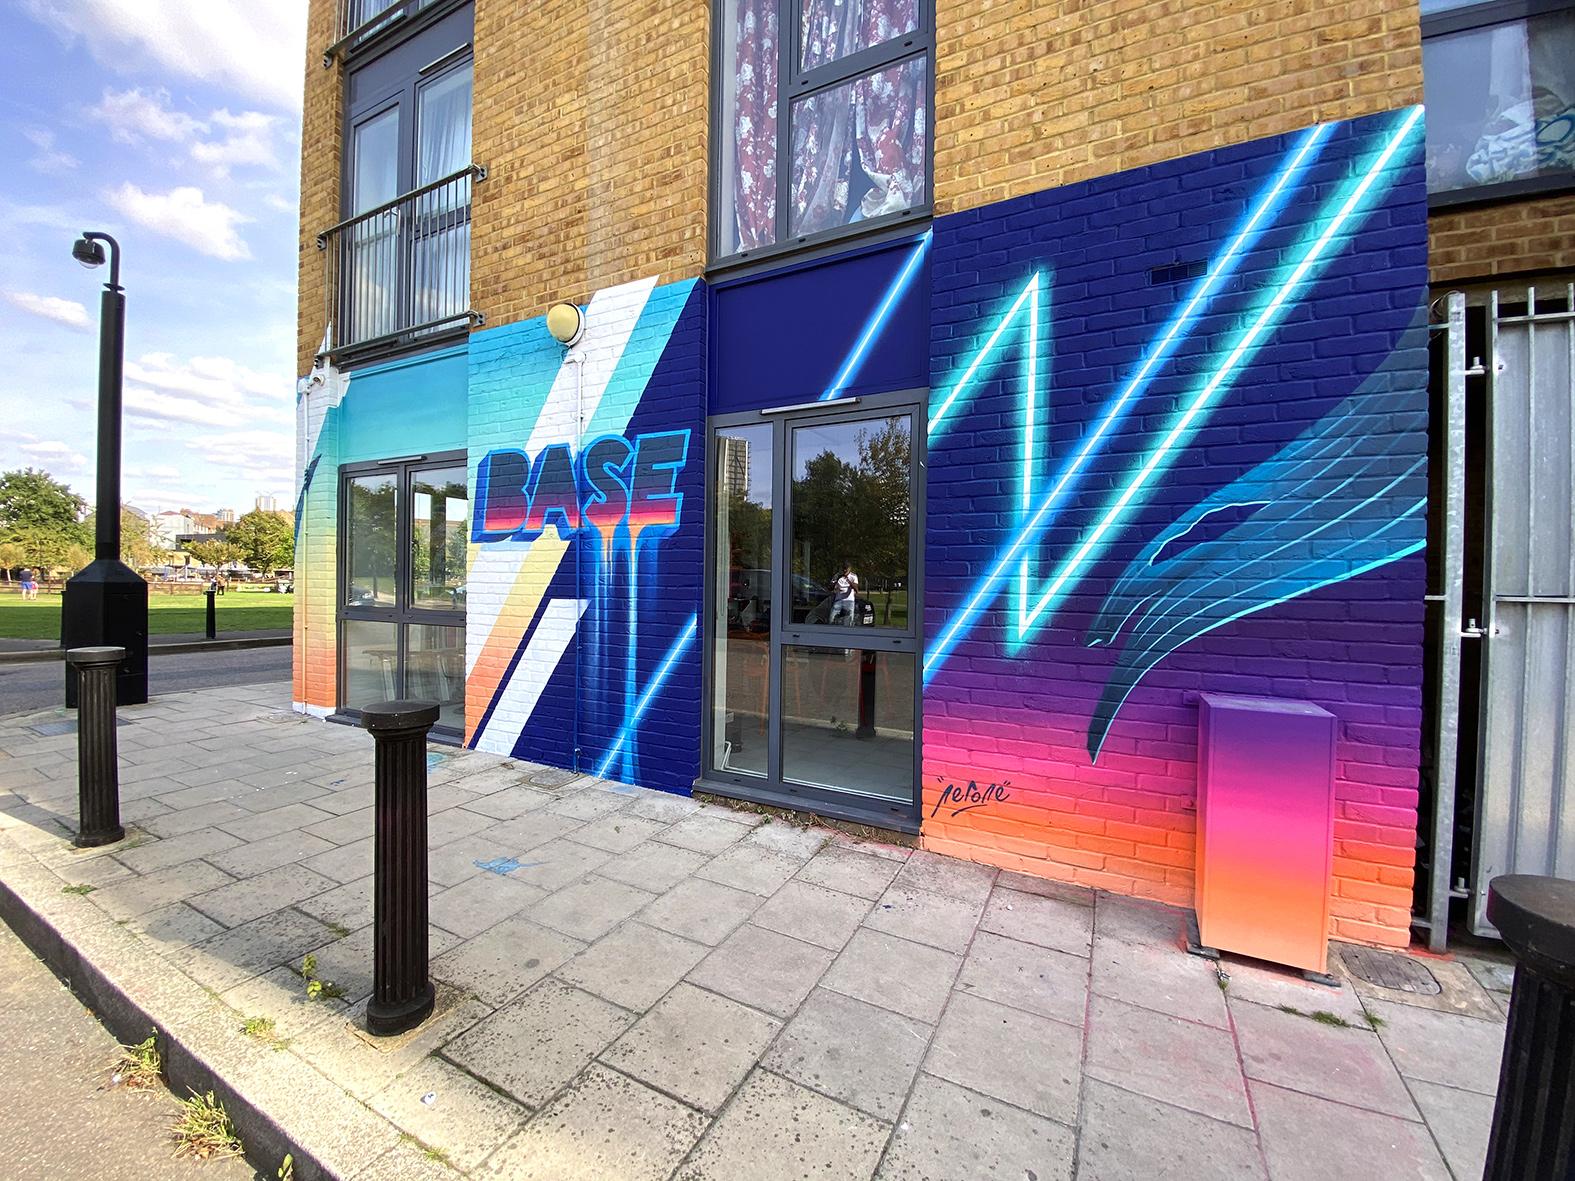 nerone-baseassociates-mural-street-art-2